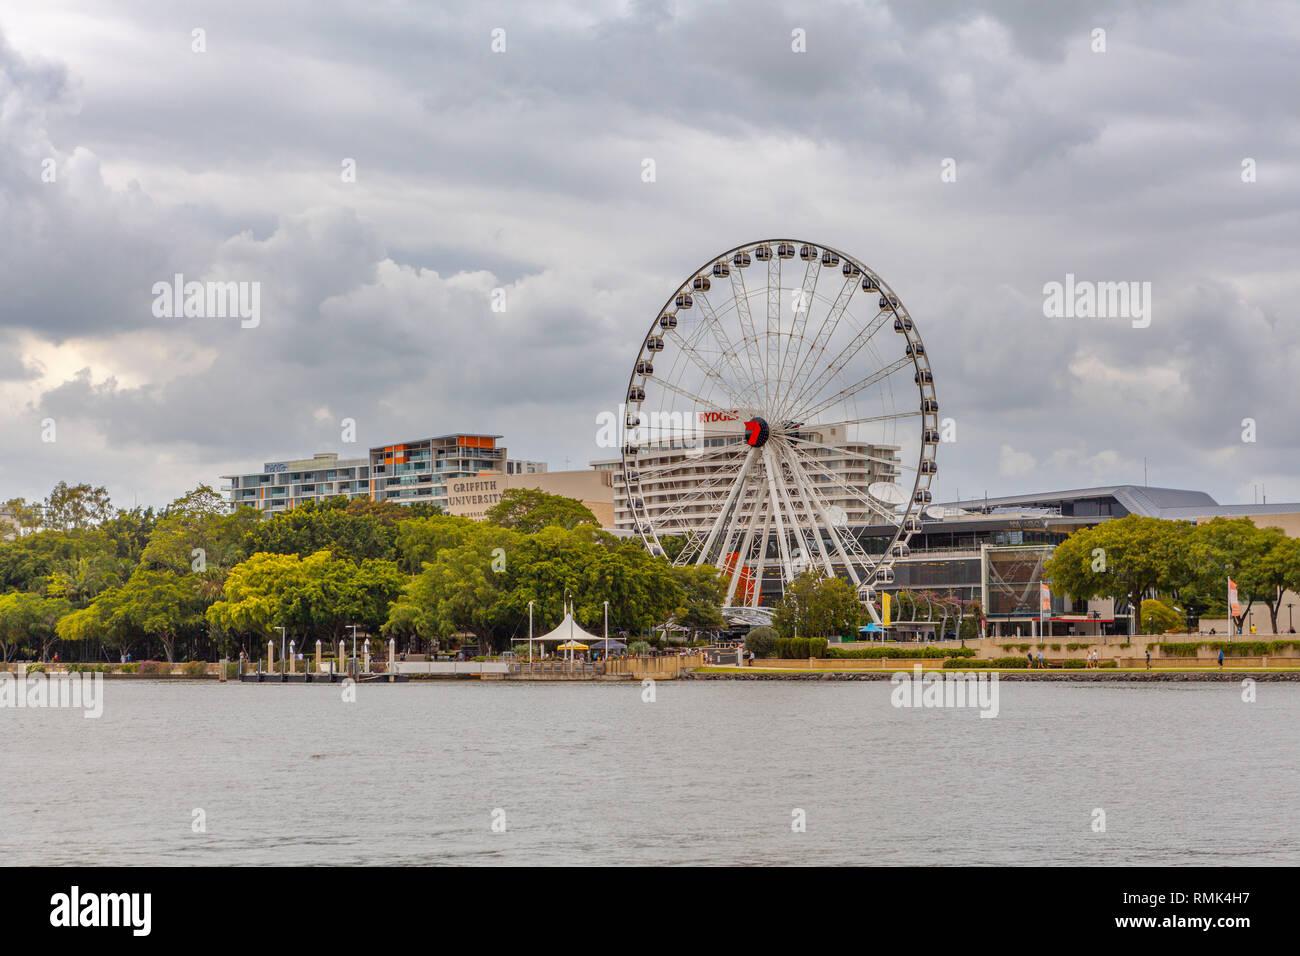 BRISBANE, Australia - January 9 2019: The Wheel of Brisbane on the South Bank - Stock Image